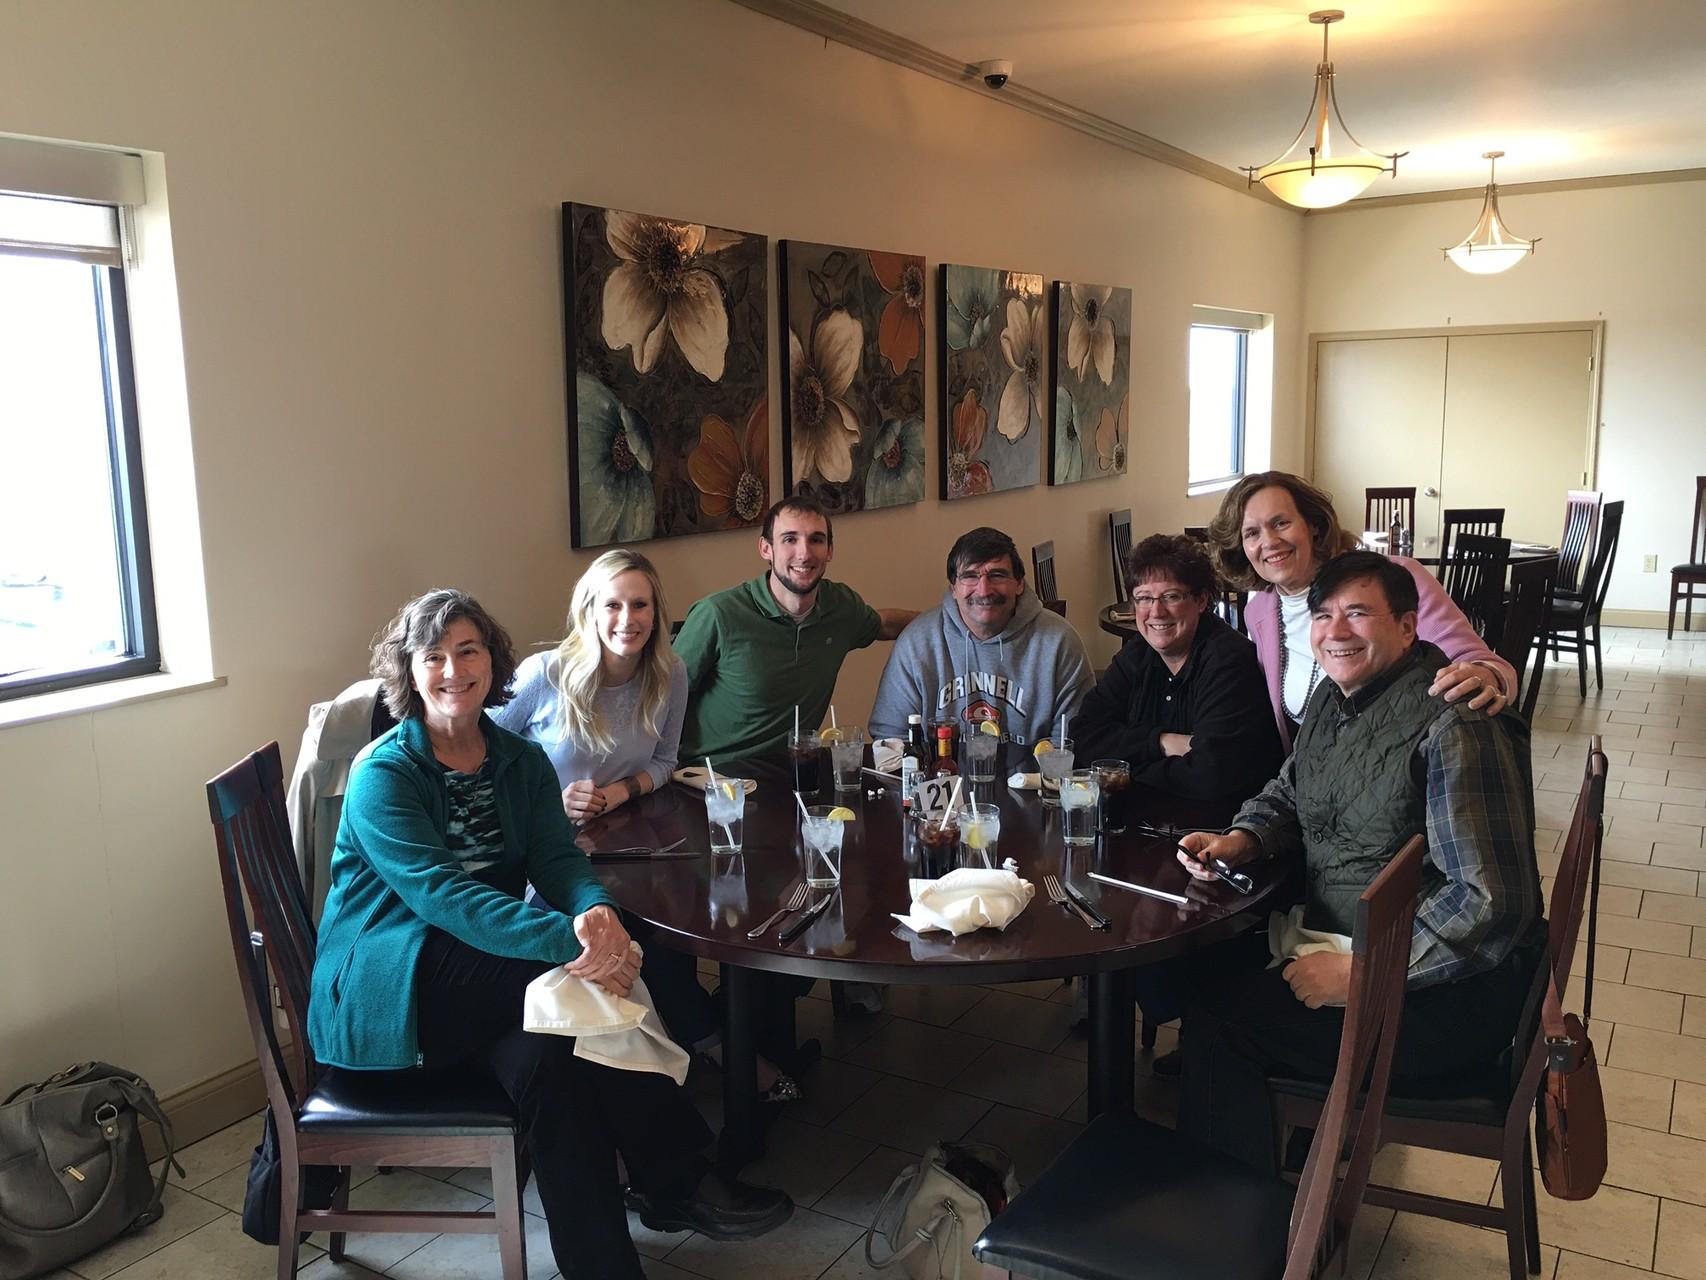 Ann Ackerman, Emily & Nick Wagner, Paul & Jill Wagner, Lorraine Gudas, John Wagner Grinnell Iowa March 6, 2016